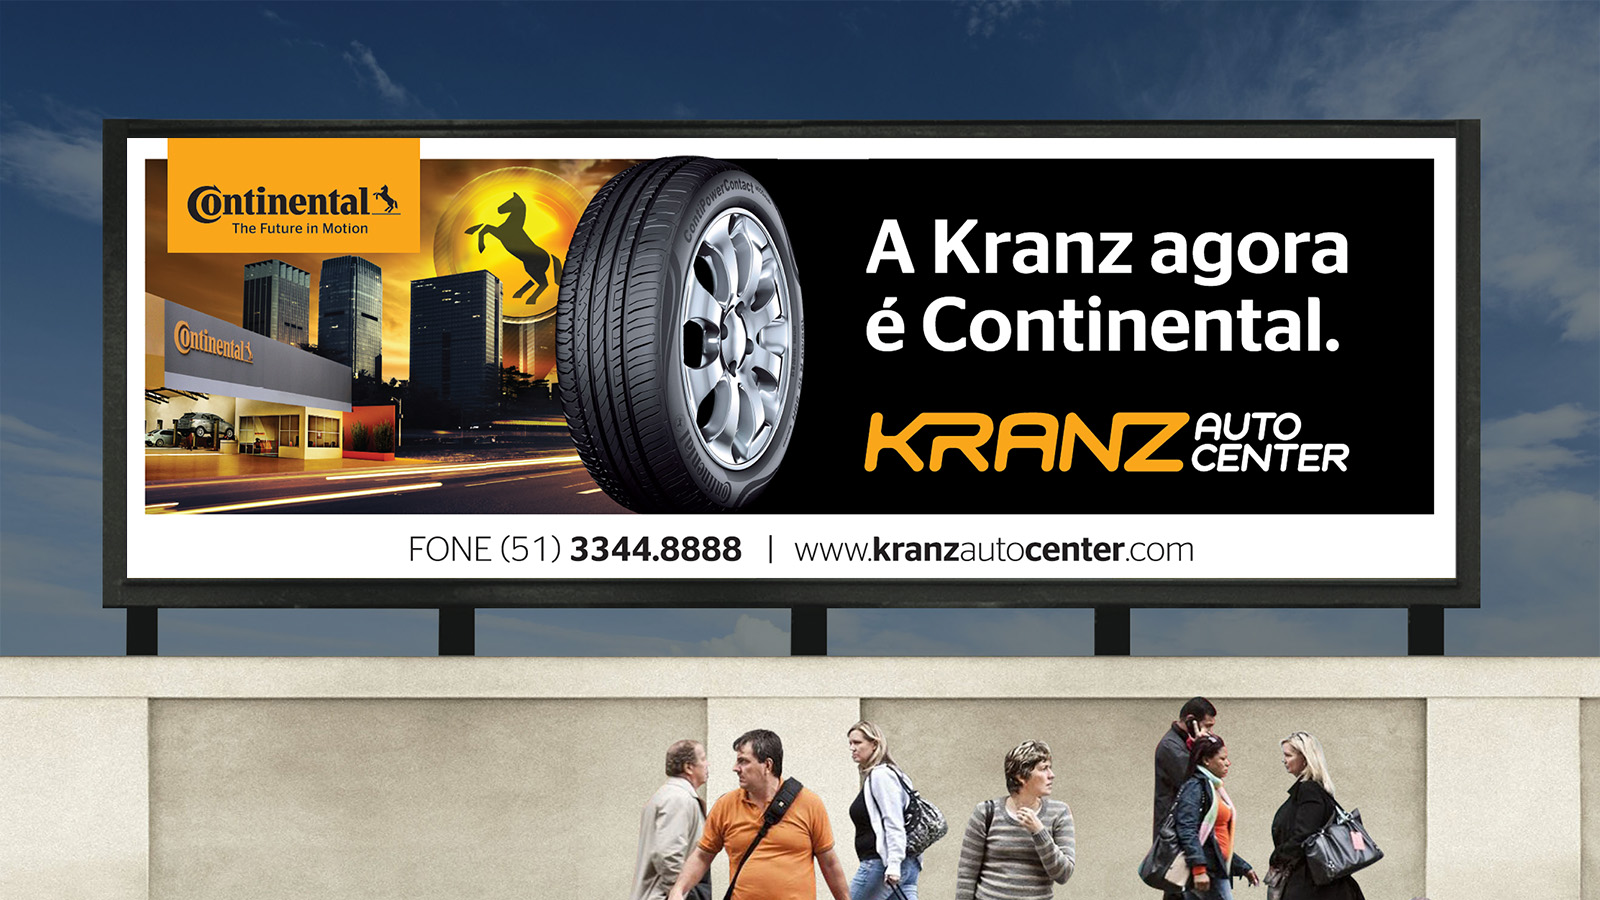 Kranz Auto Center - Continental